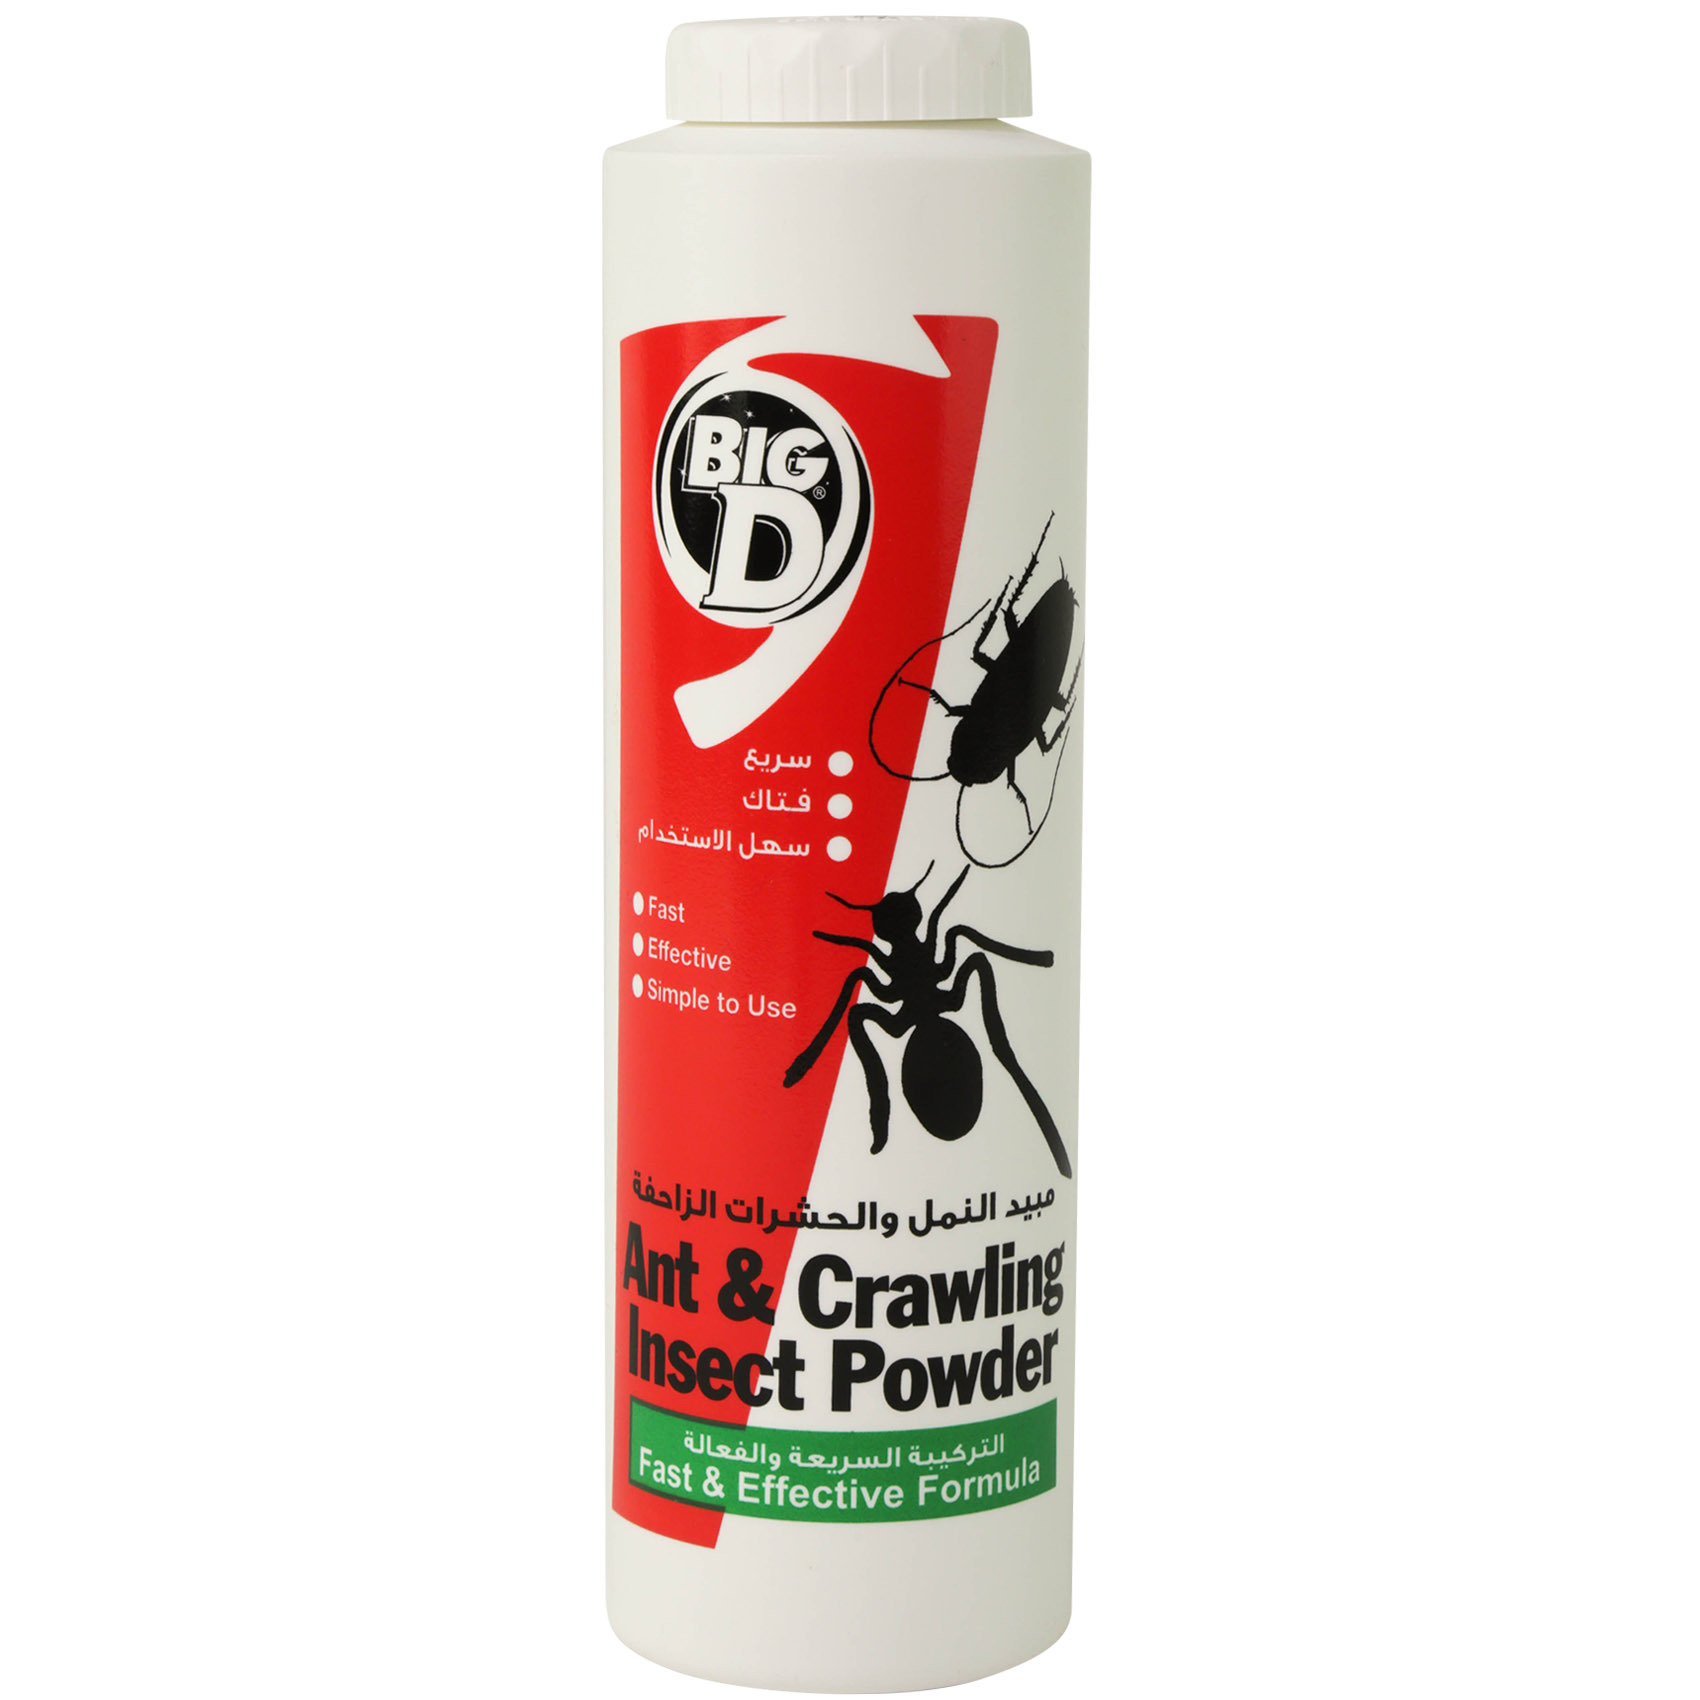 BIG D ANT & CRAWLING INSECT POWDER